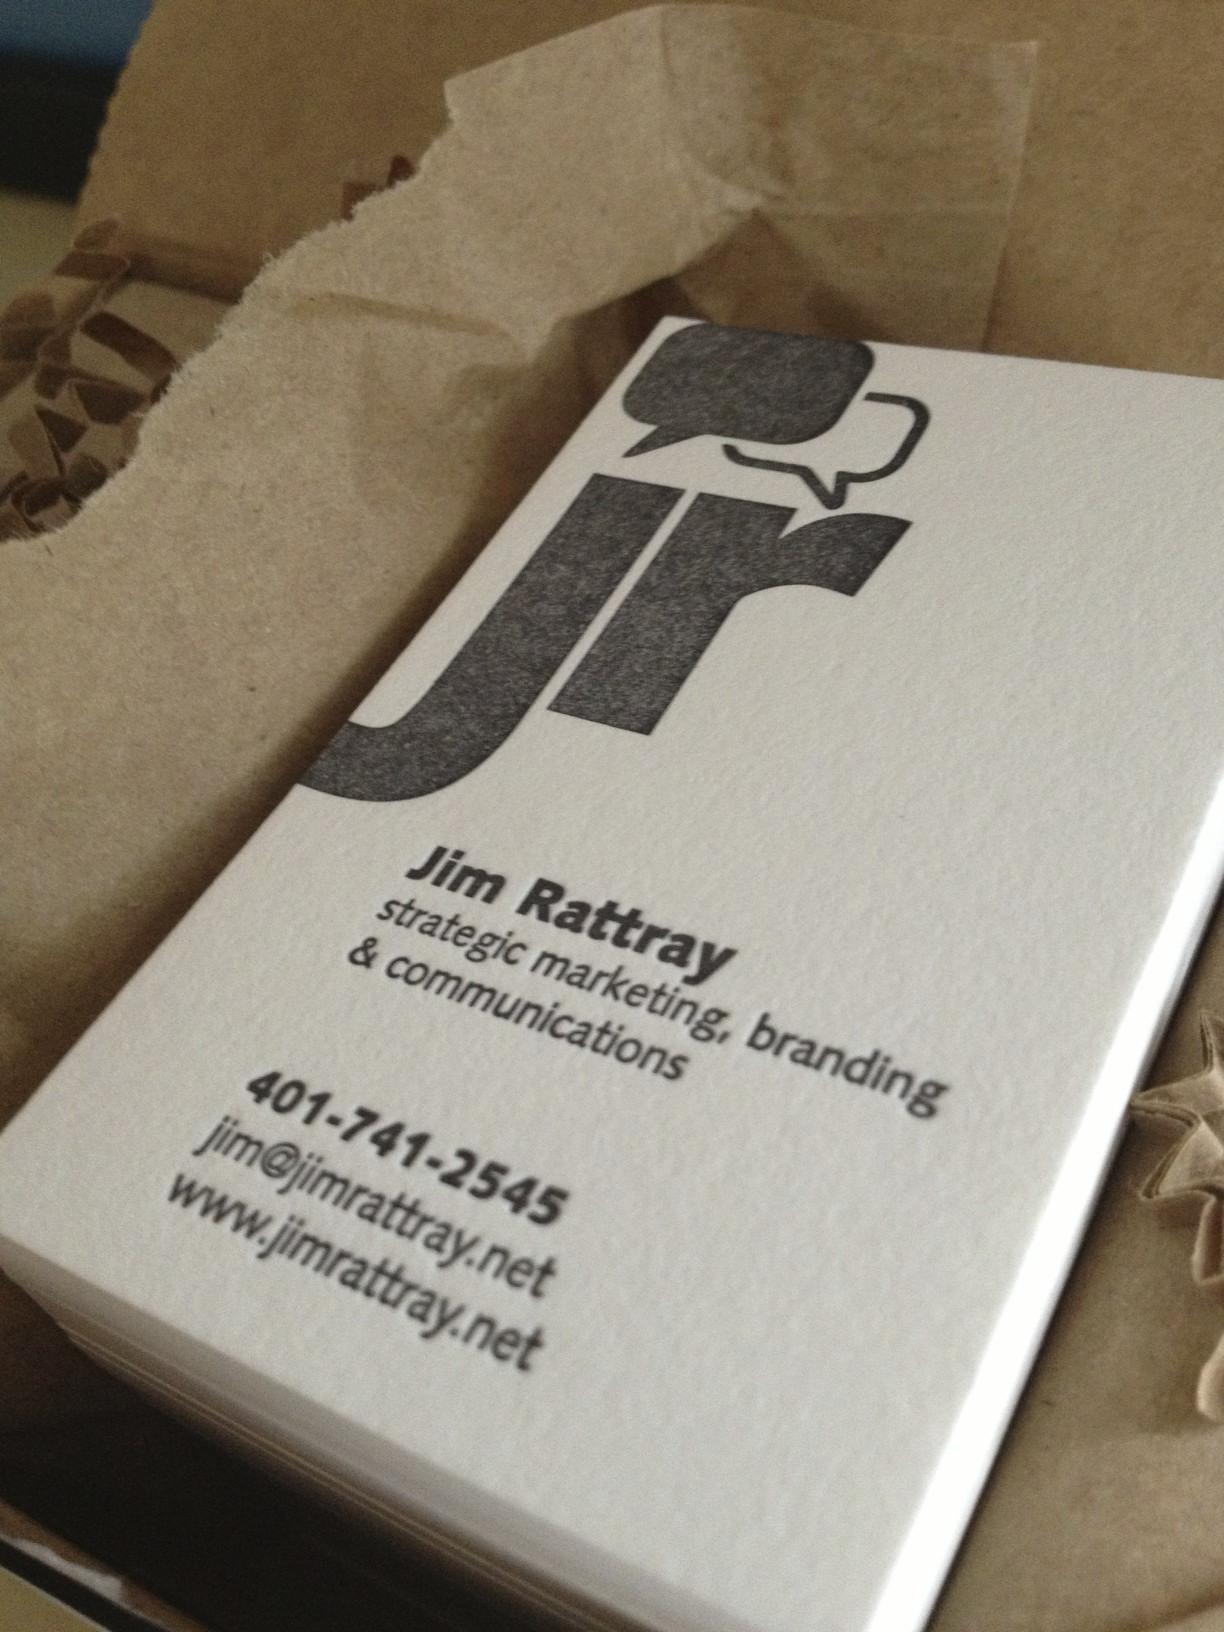 2014-0123-JR biz cards.jpg